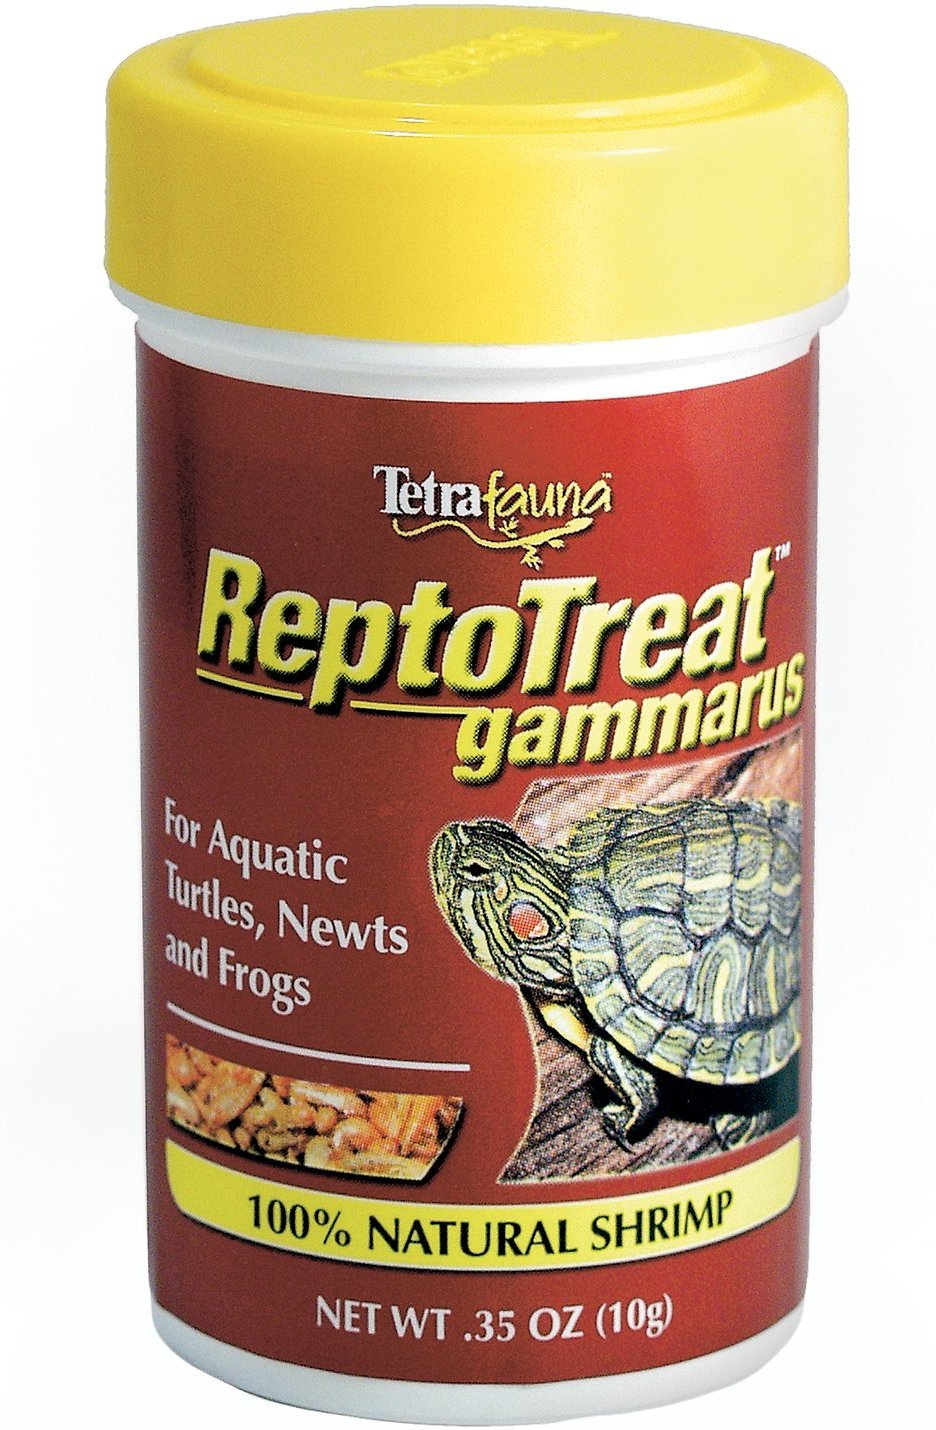 Tetrafauna ReptoTreat Gammarus Turtle, Newt & Frog Treats, .35-oz jar